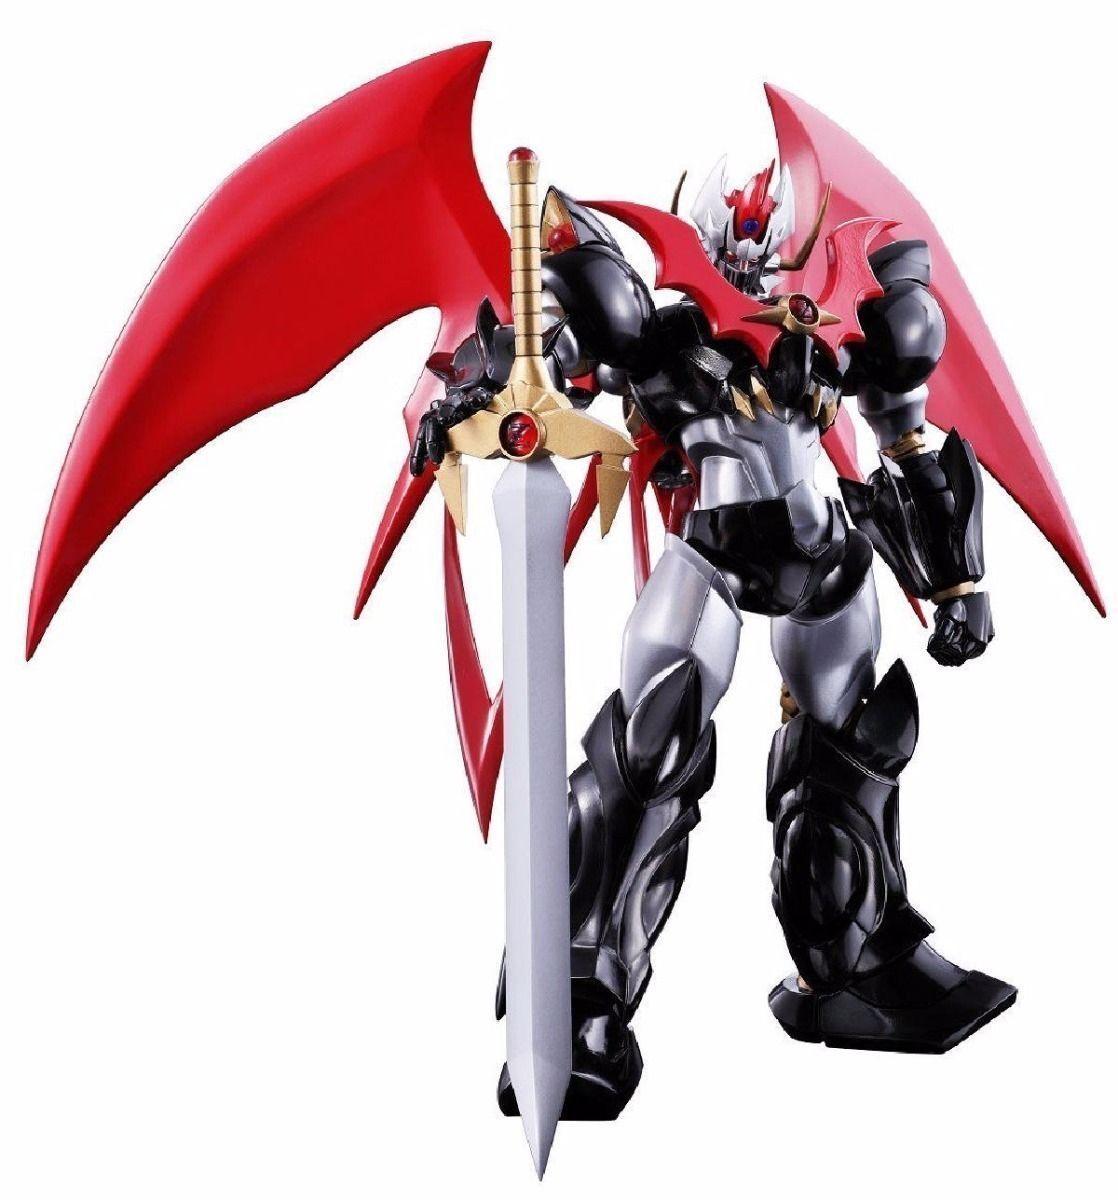 Super Robot Chogokin MAZINKAISER Action Figure BANDAI TAMASHII NATIONS Japan